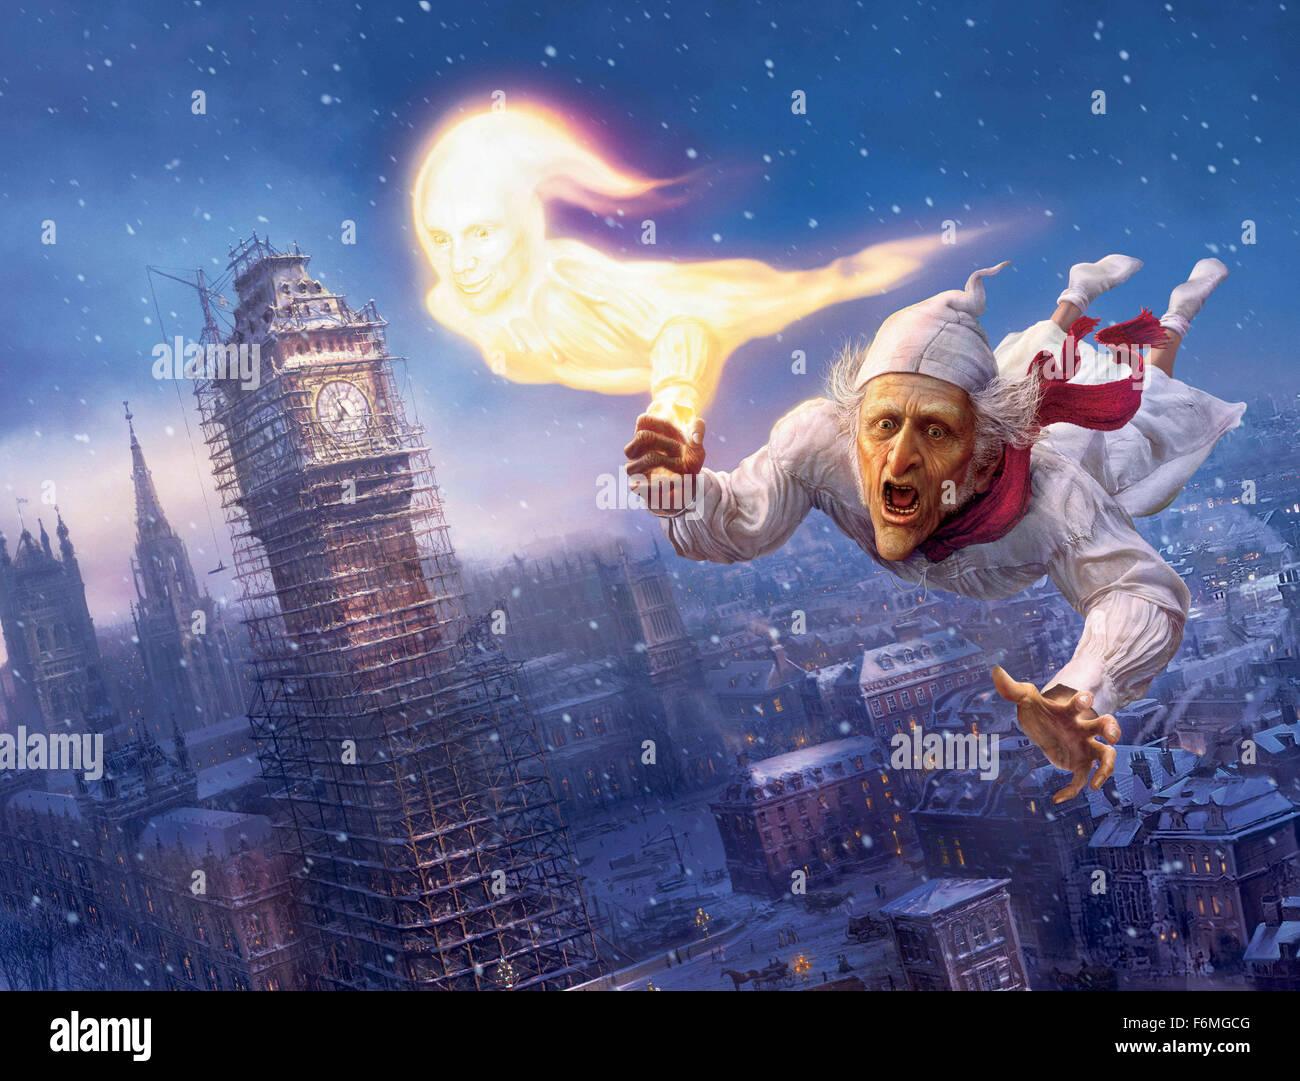 A Christmas Carol Movie.Release Date November 6 2009 Movie Title A Christmas